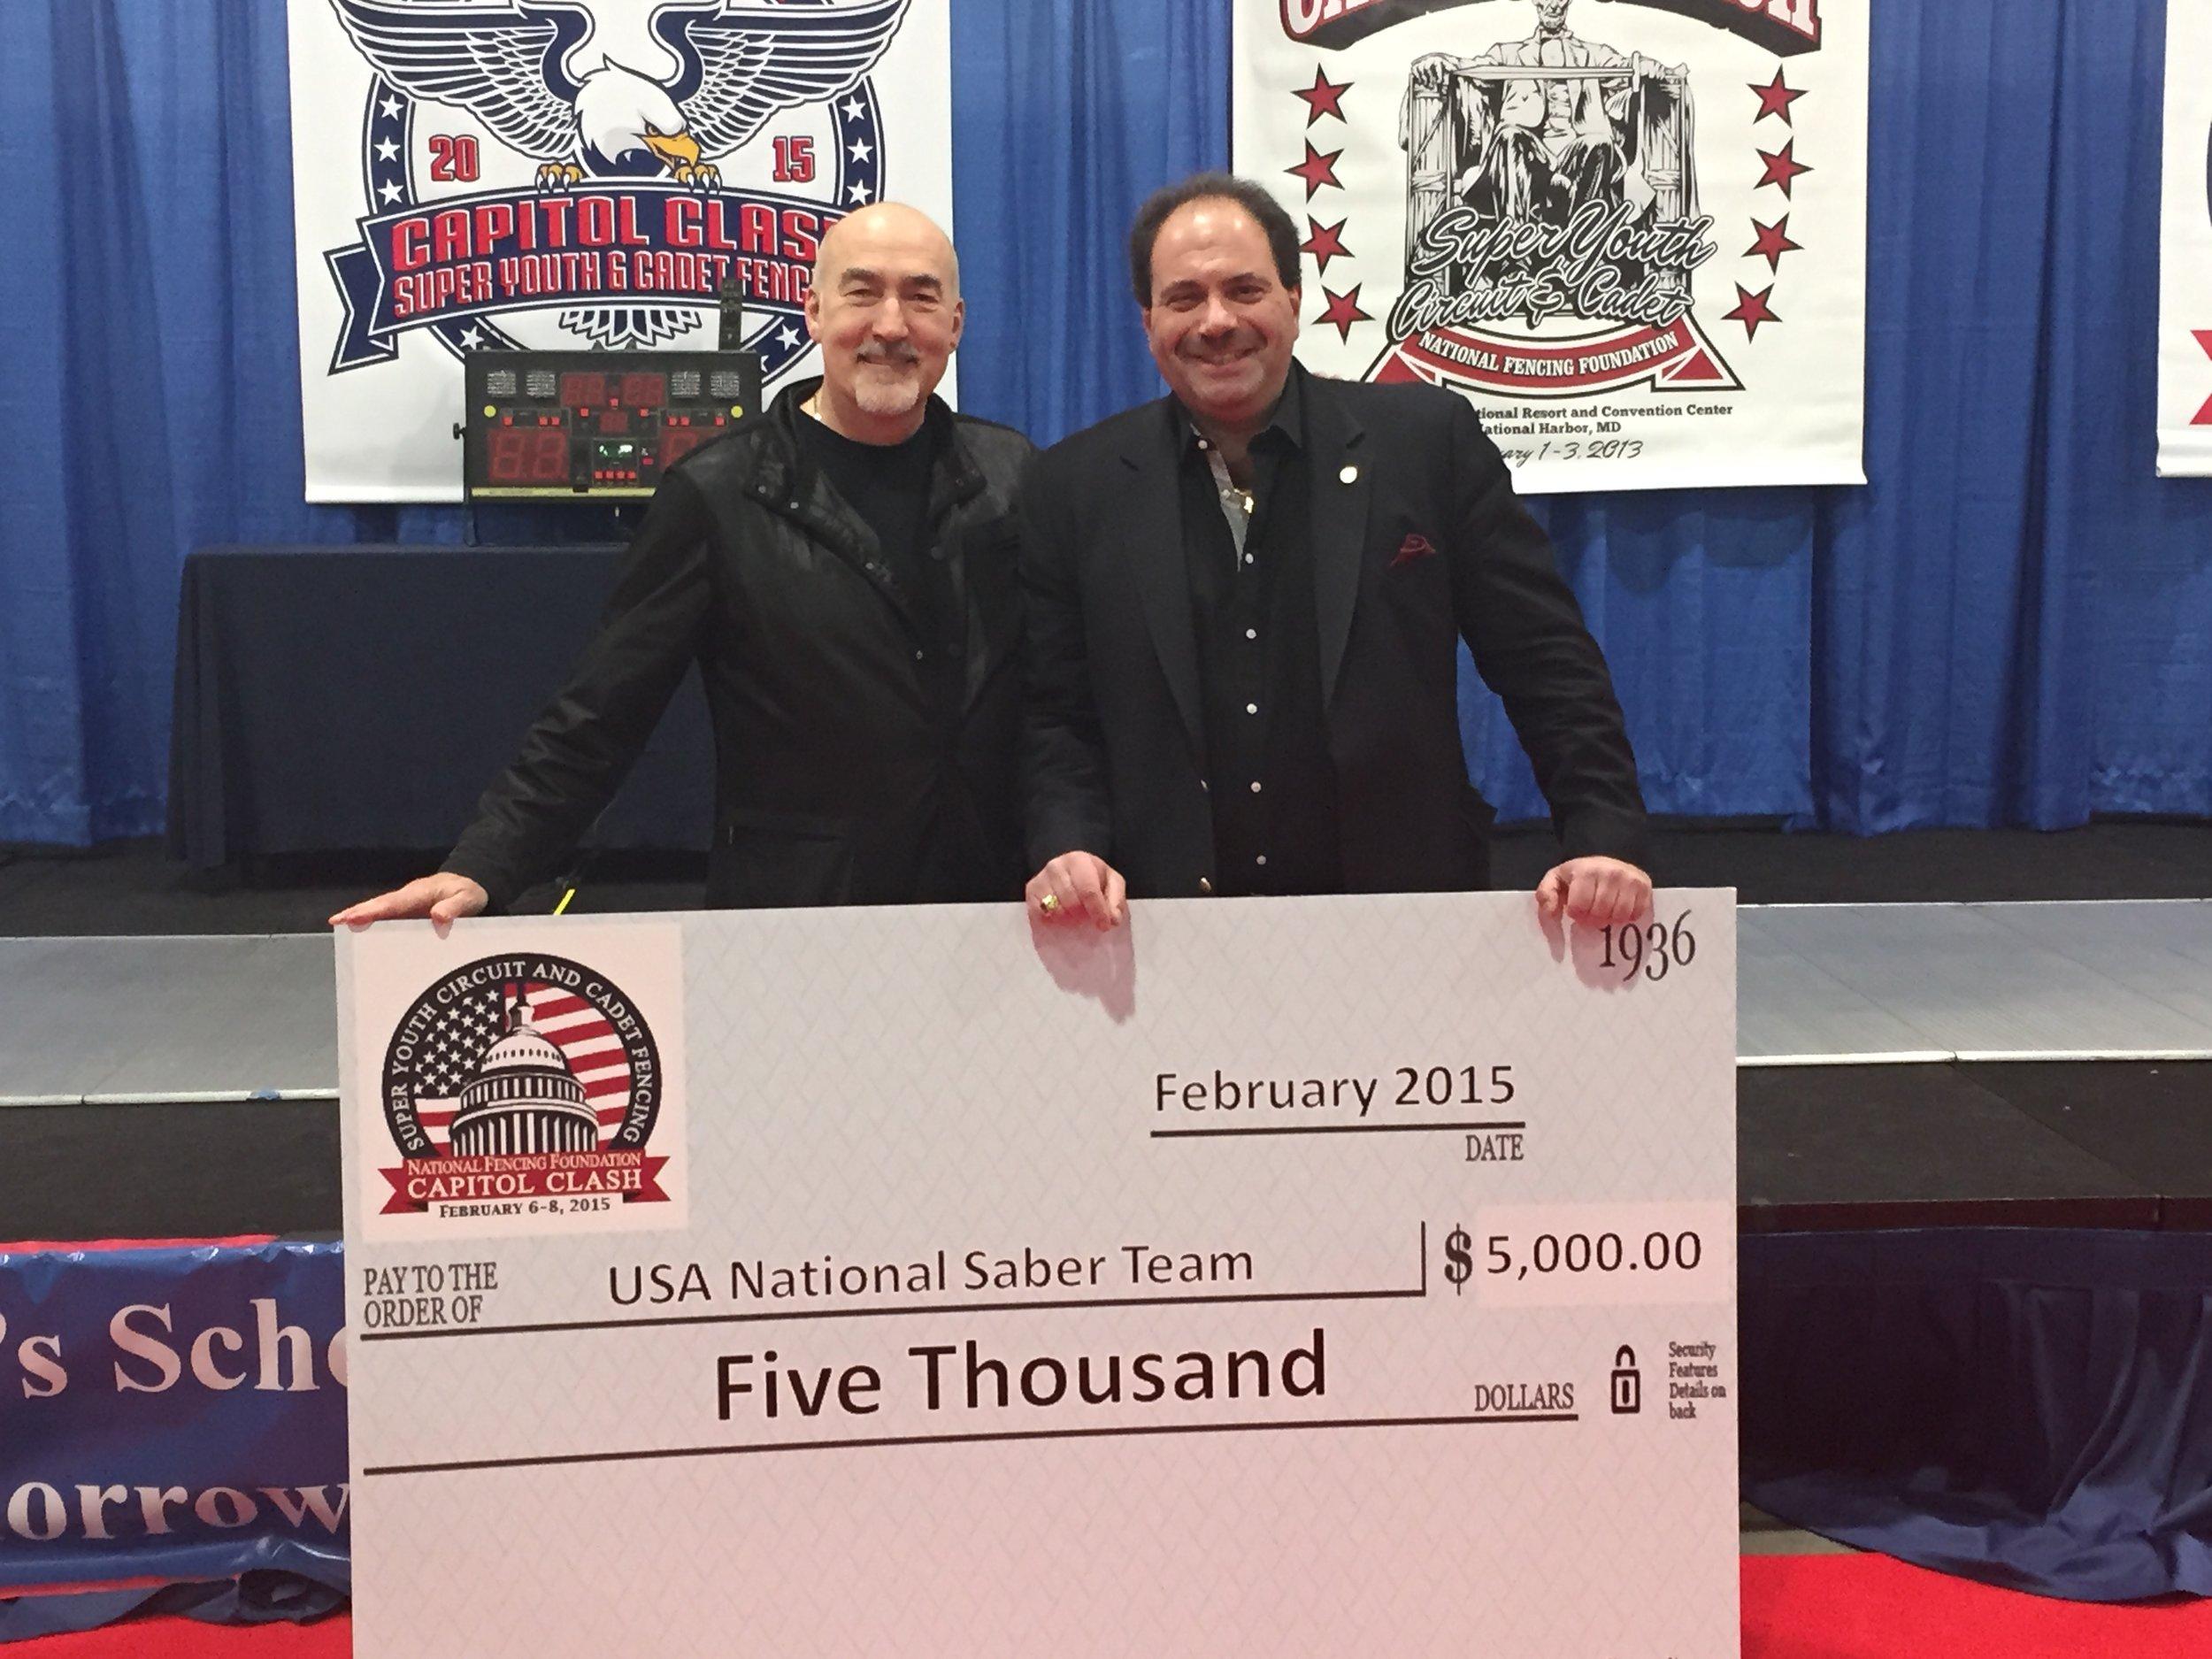 2015 Donation to the USA National Saber Team with Senior USA Team Coach, Zoron Tulum & National Fencing Foundation president, Alexandre Ryjik